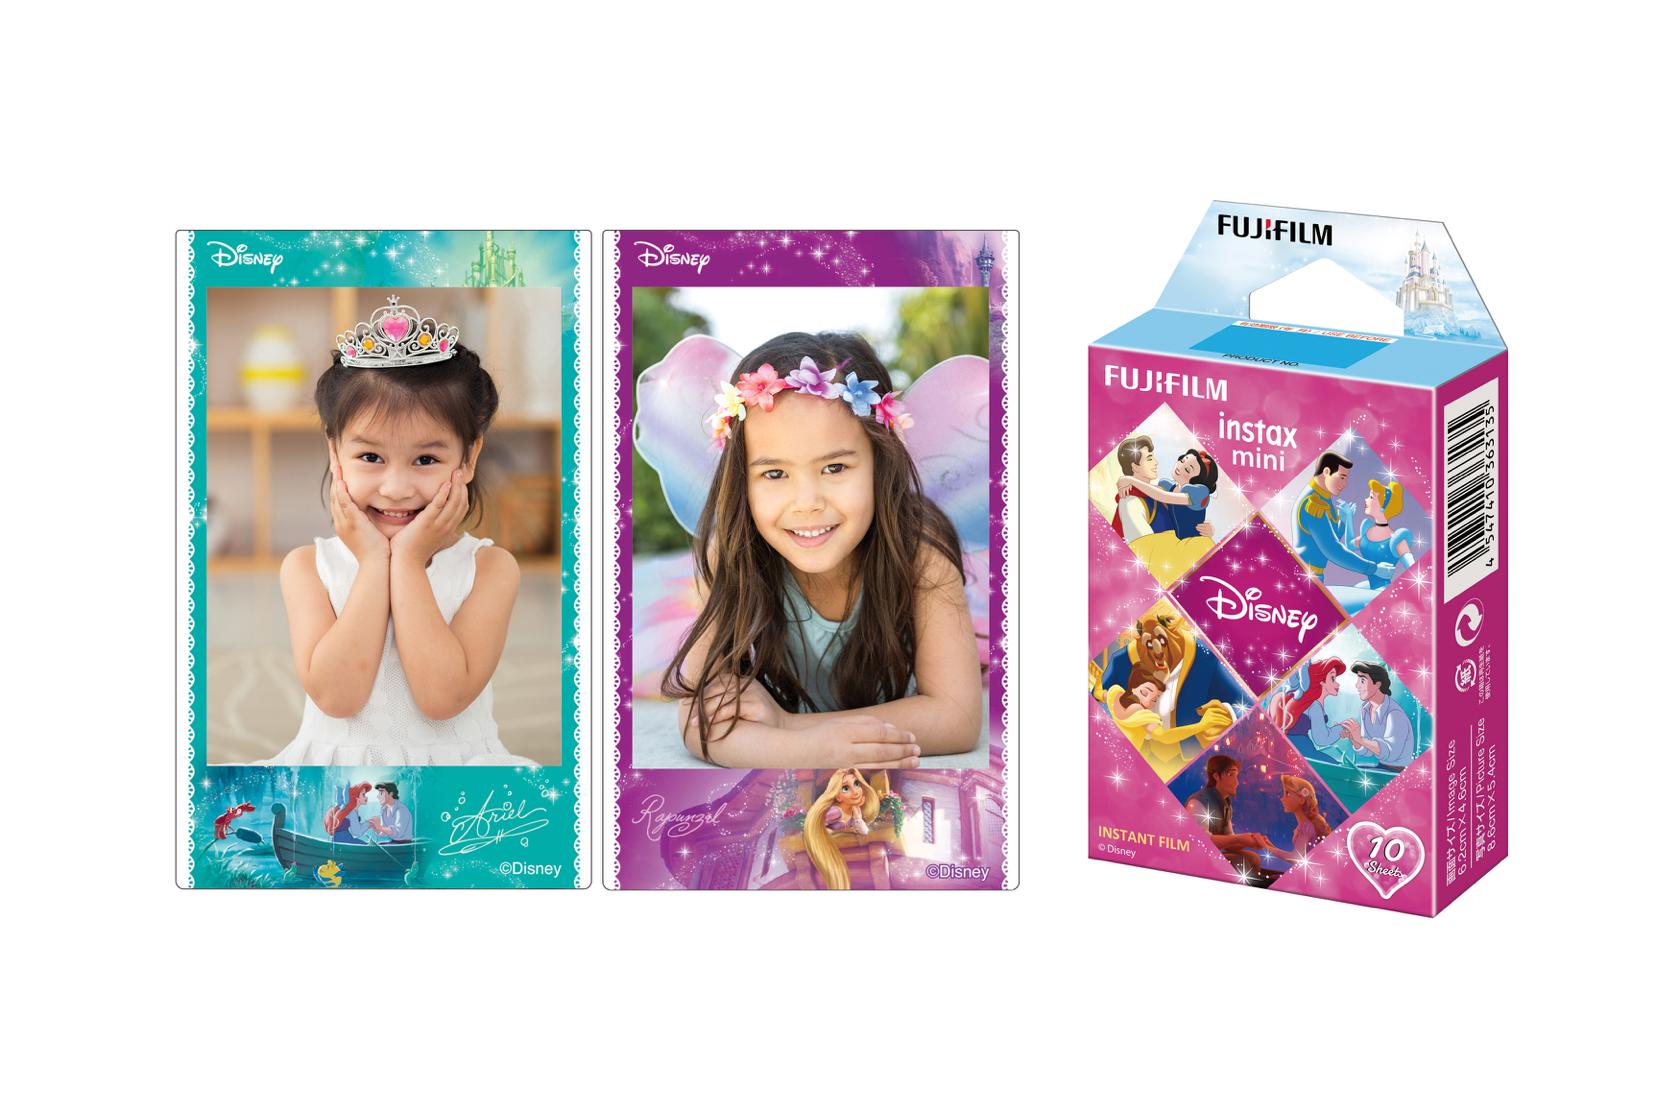 Kid photos on INSTAX Mini Disney Princess Film next to INSTAX Mini Disney Princess Film box